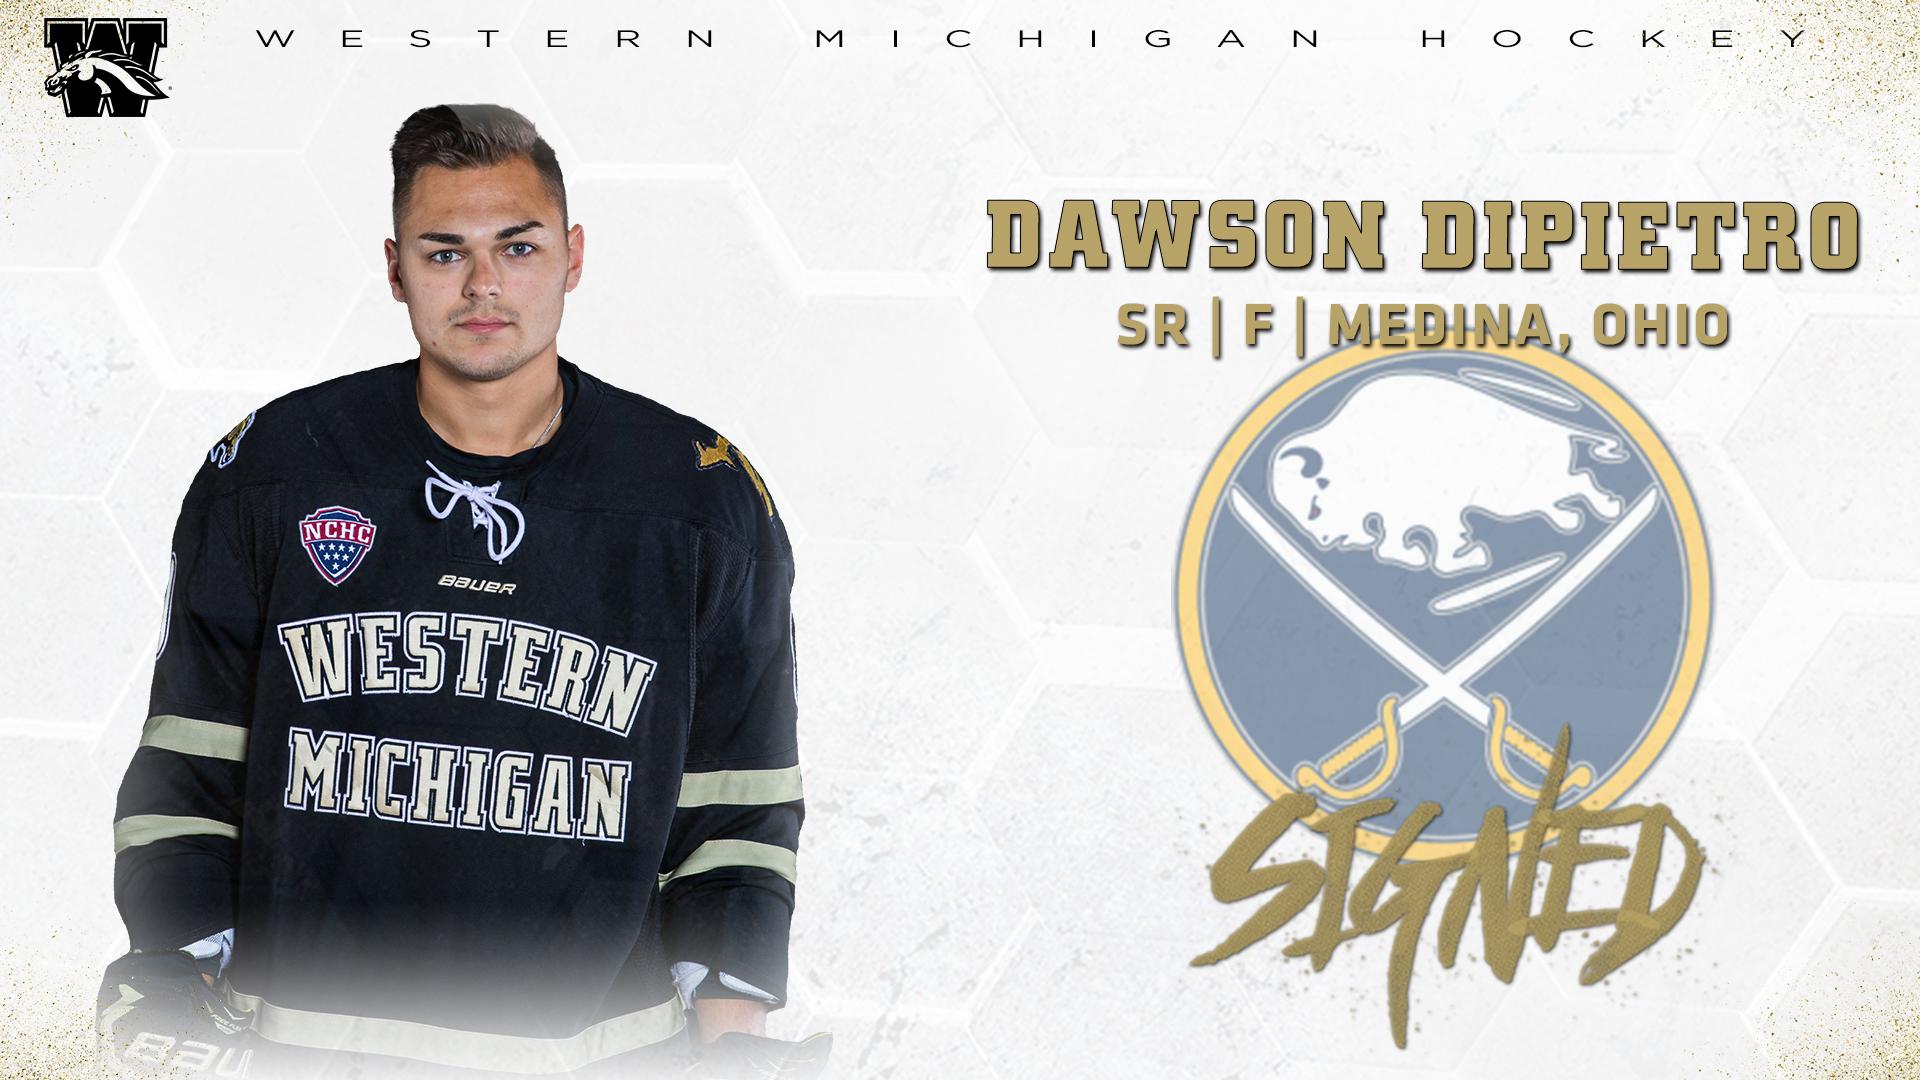 Dawson DiPietro